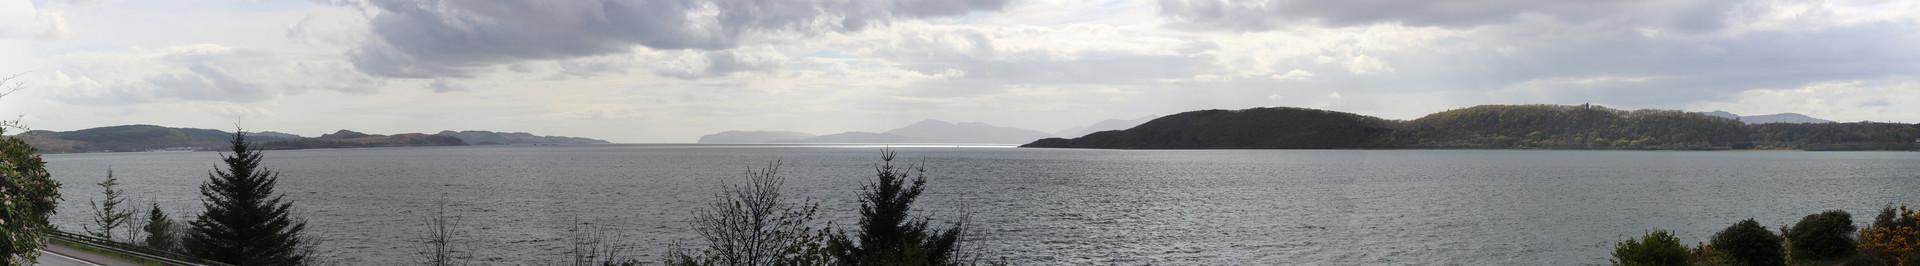 Shieldaig, Scotland